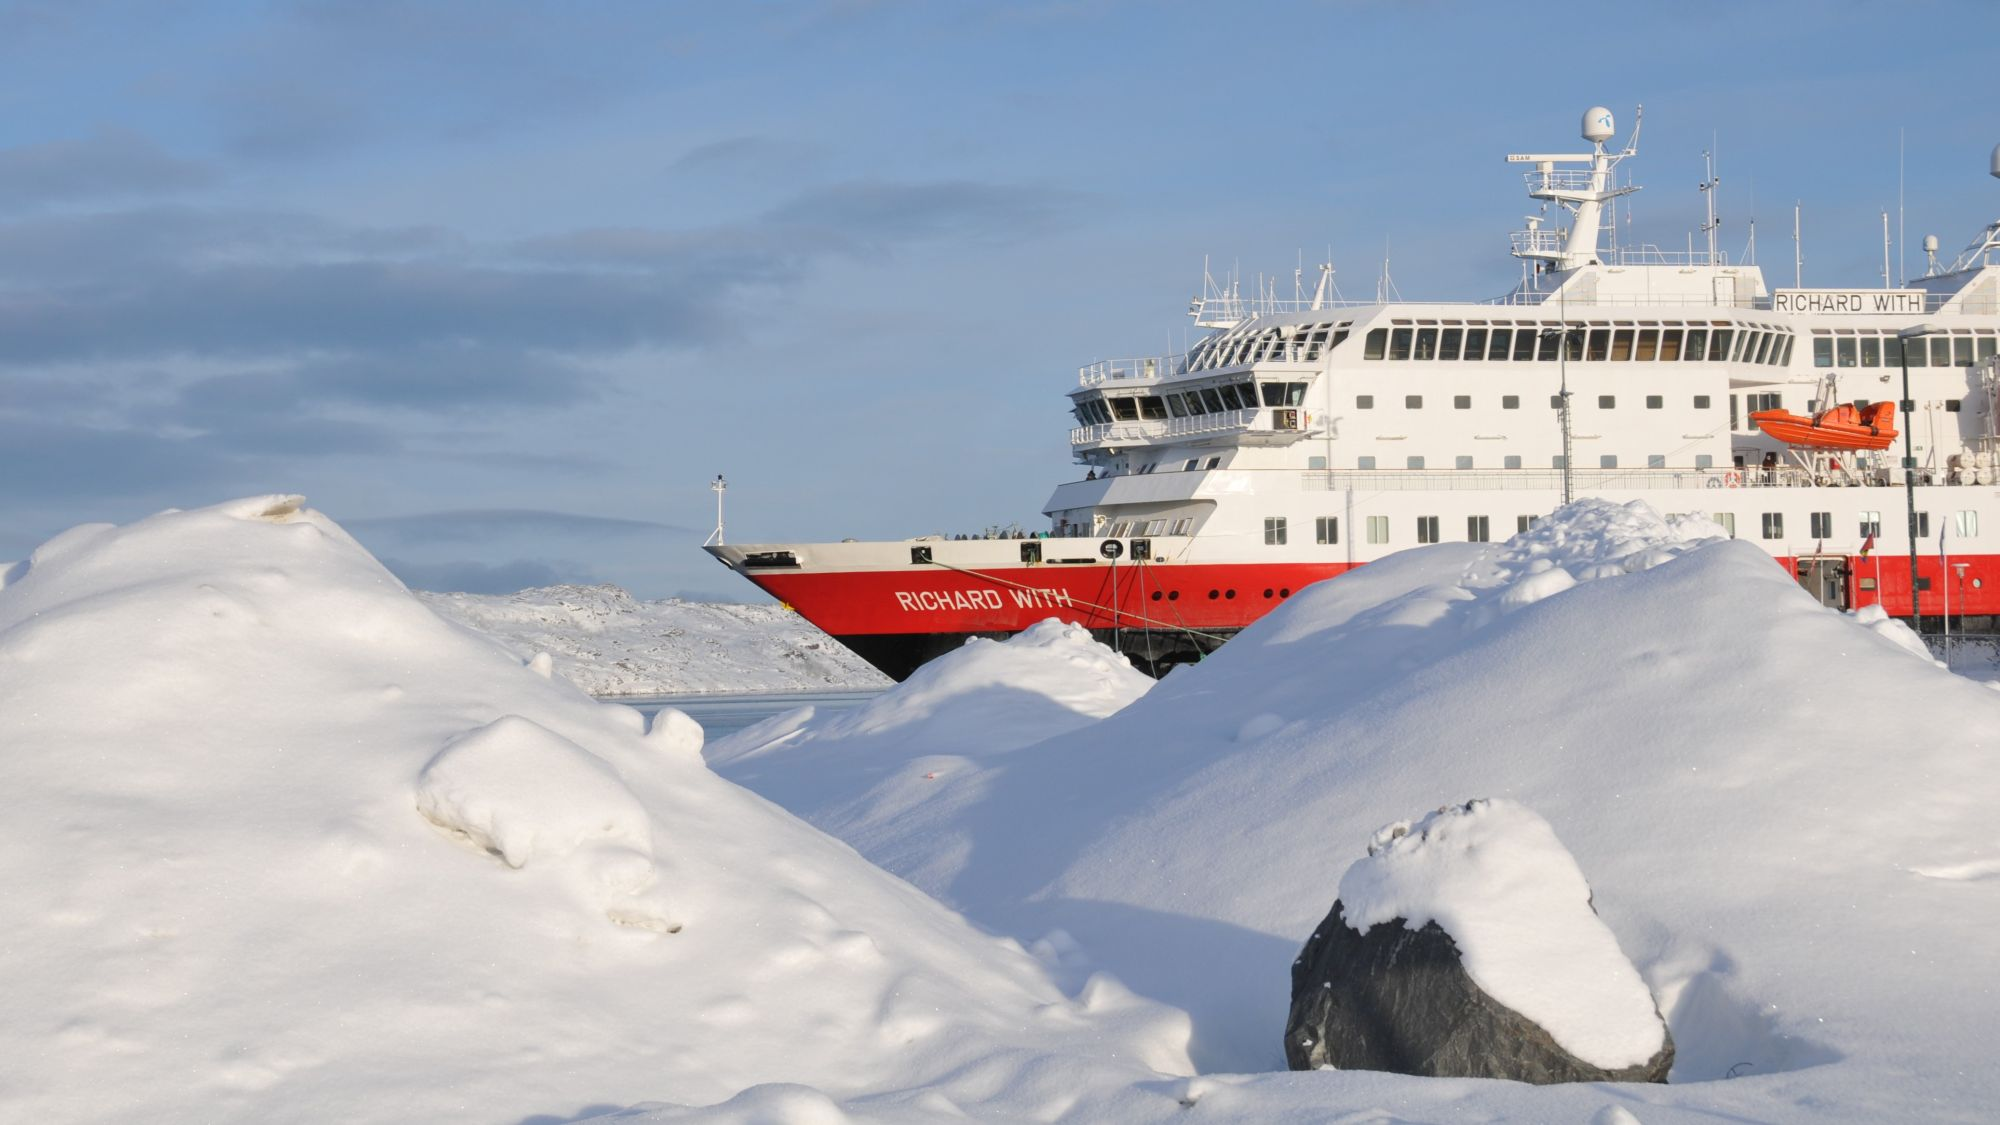 Hurtigrutenschiff Richard With im Schnee